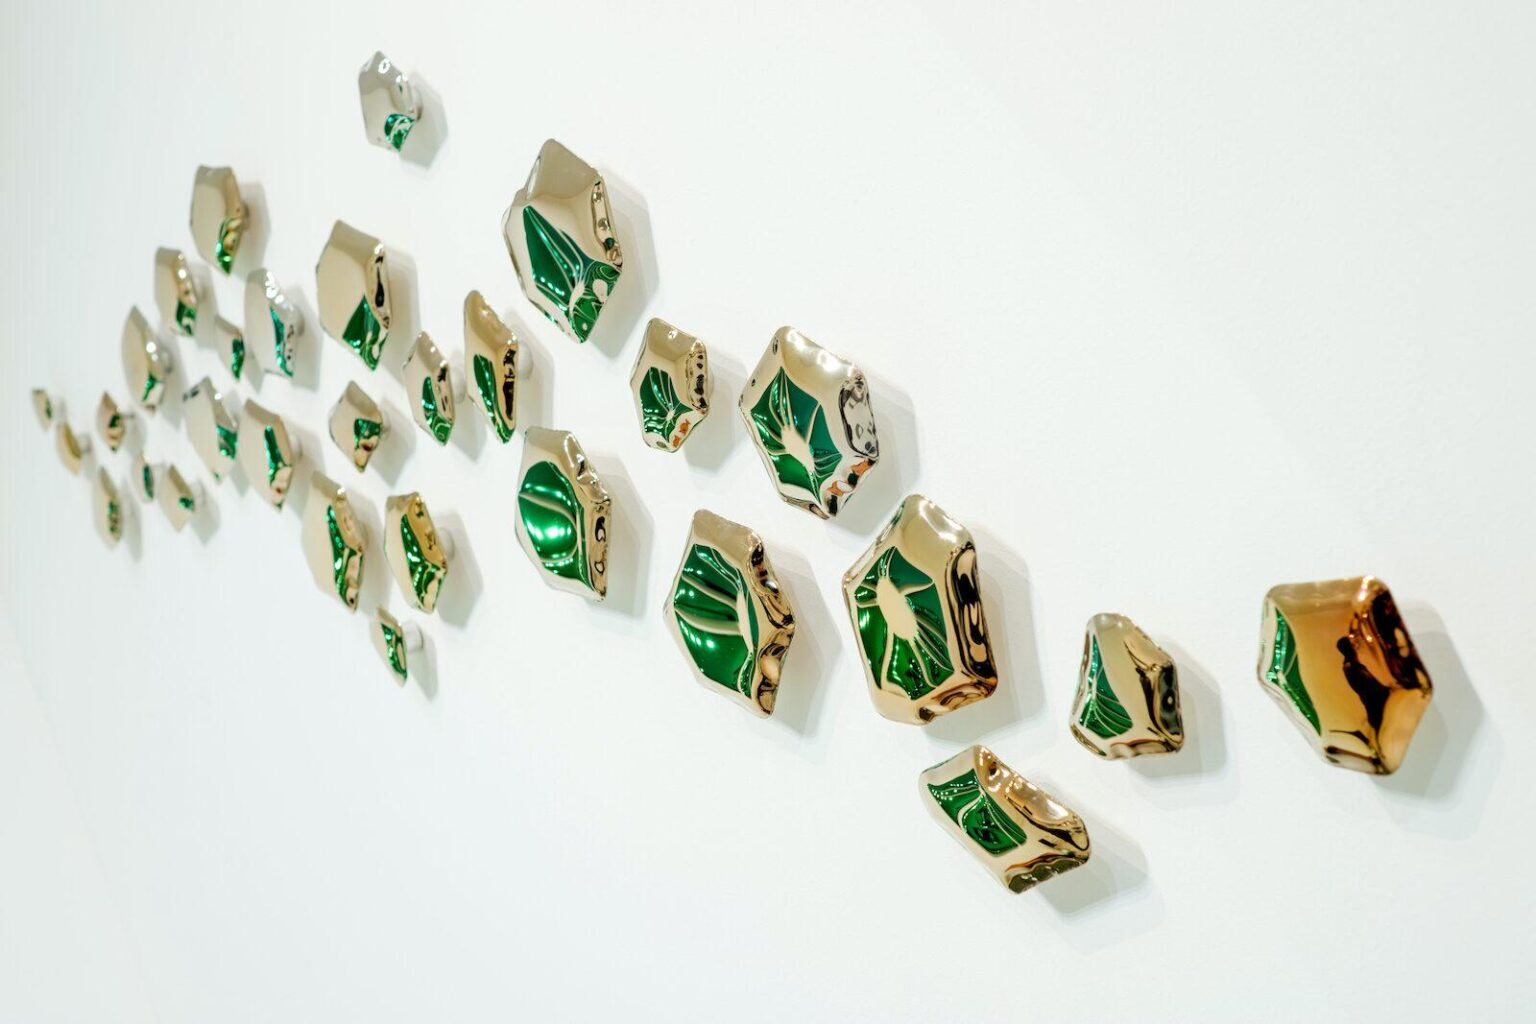 kamyki flamed gold wall hangers